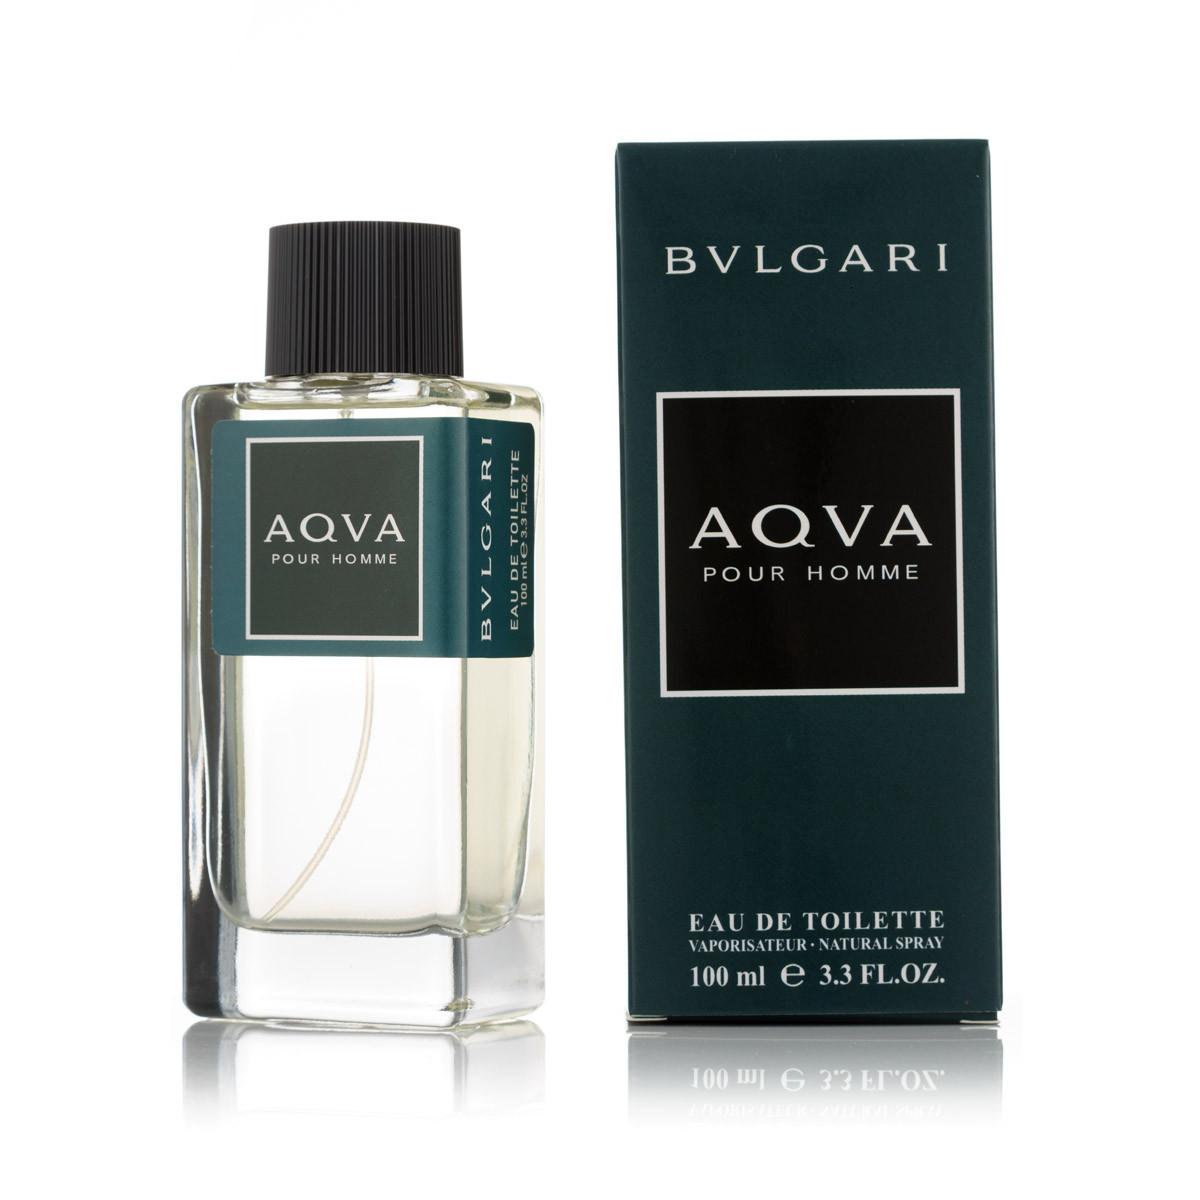 Туалетная вода Bvlgari Aqua pour homme 100 мл